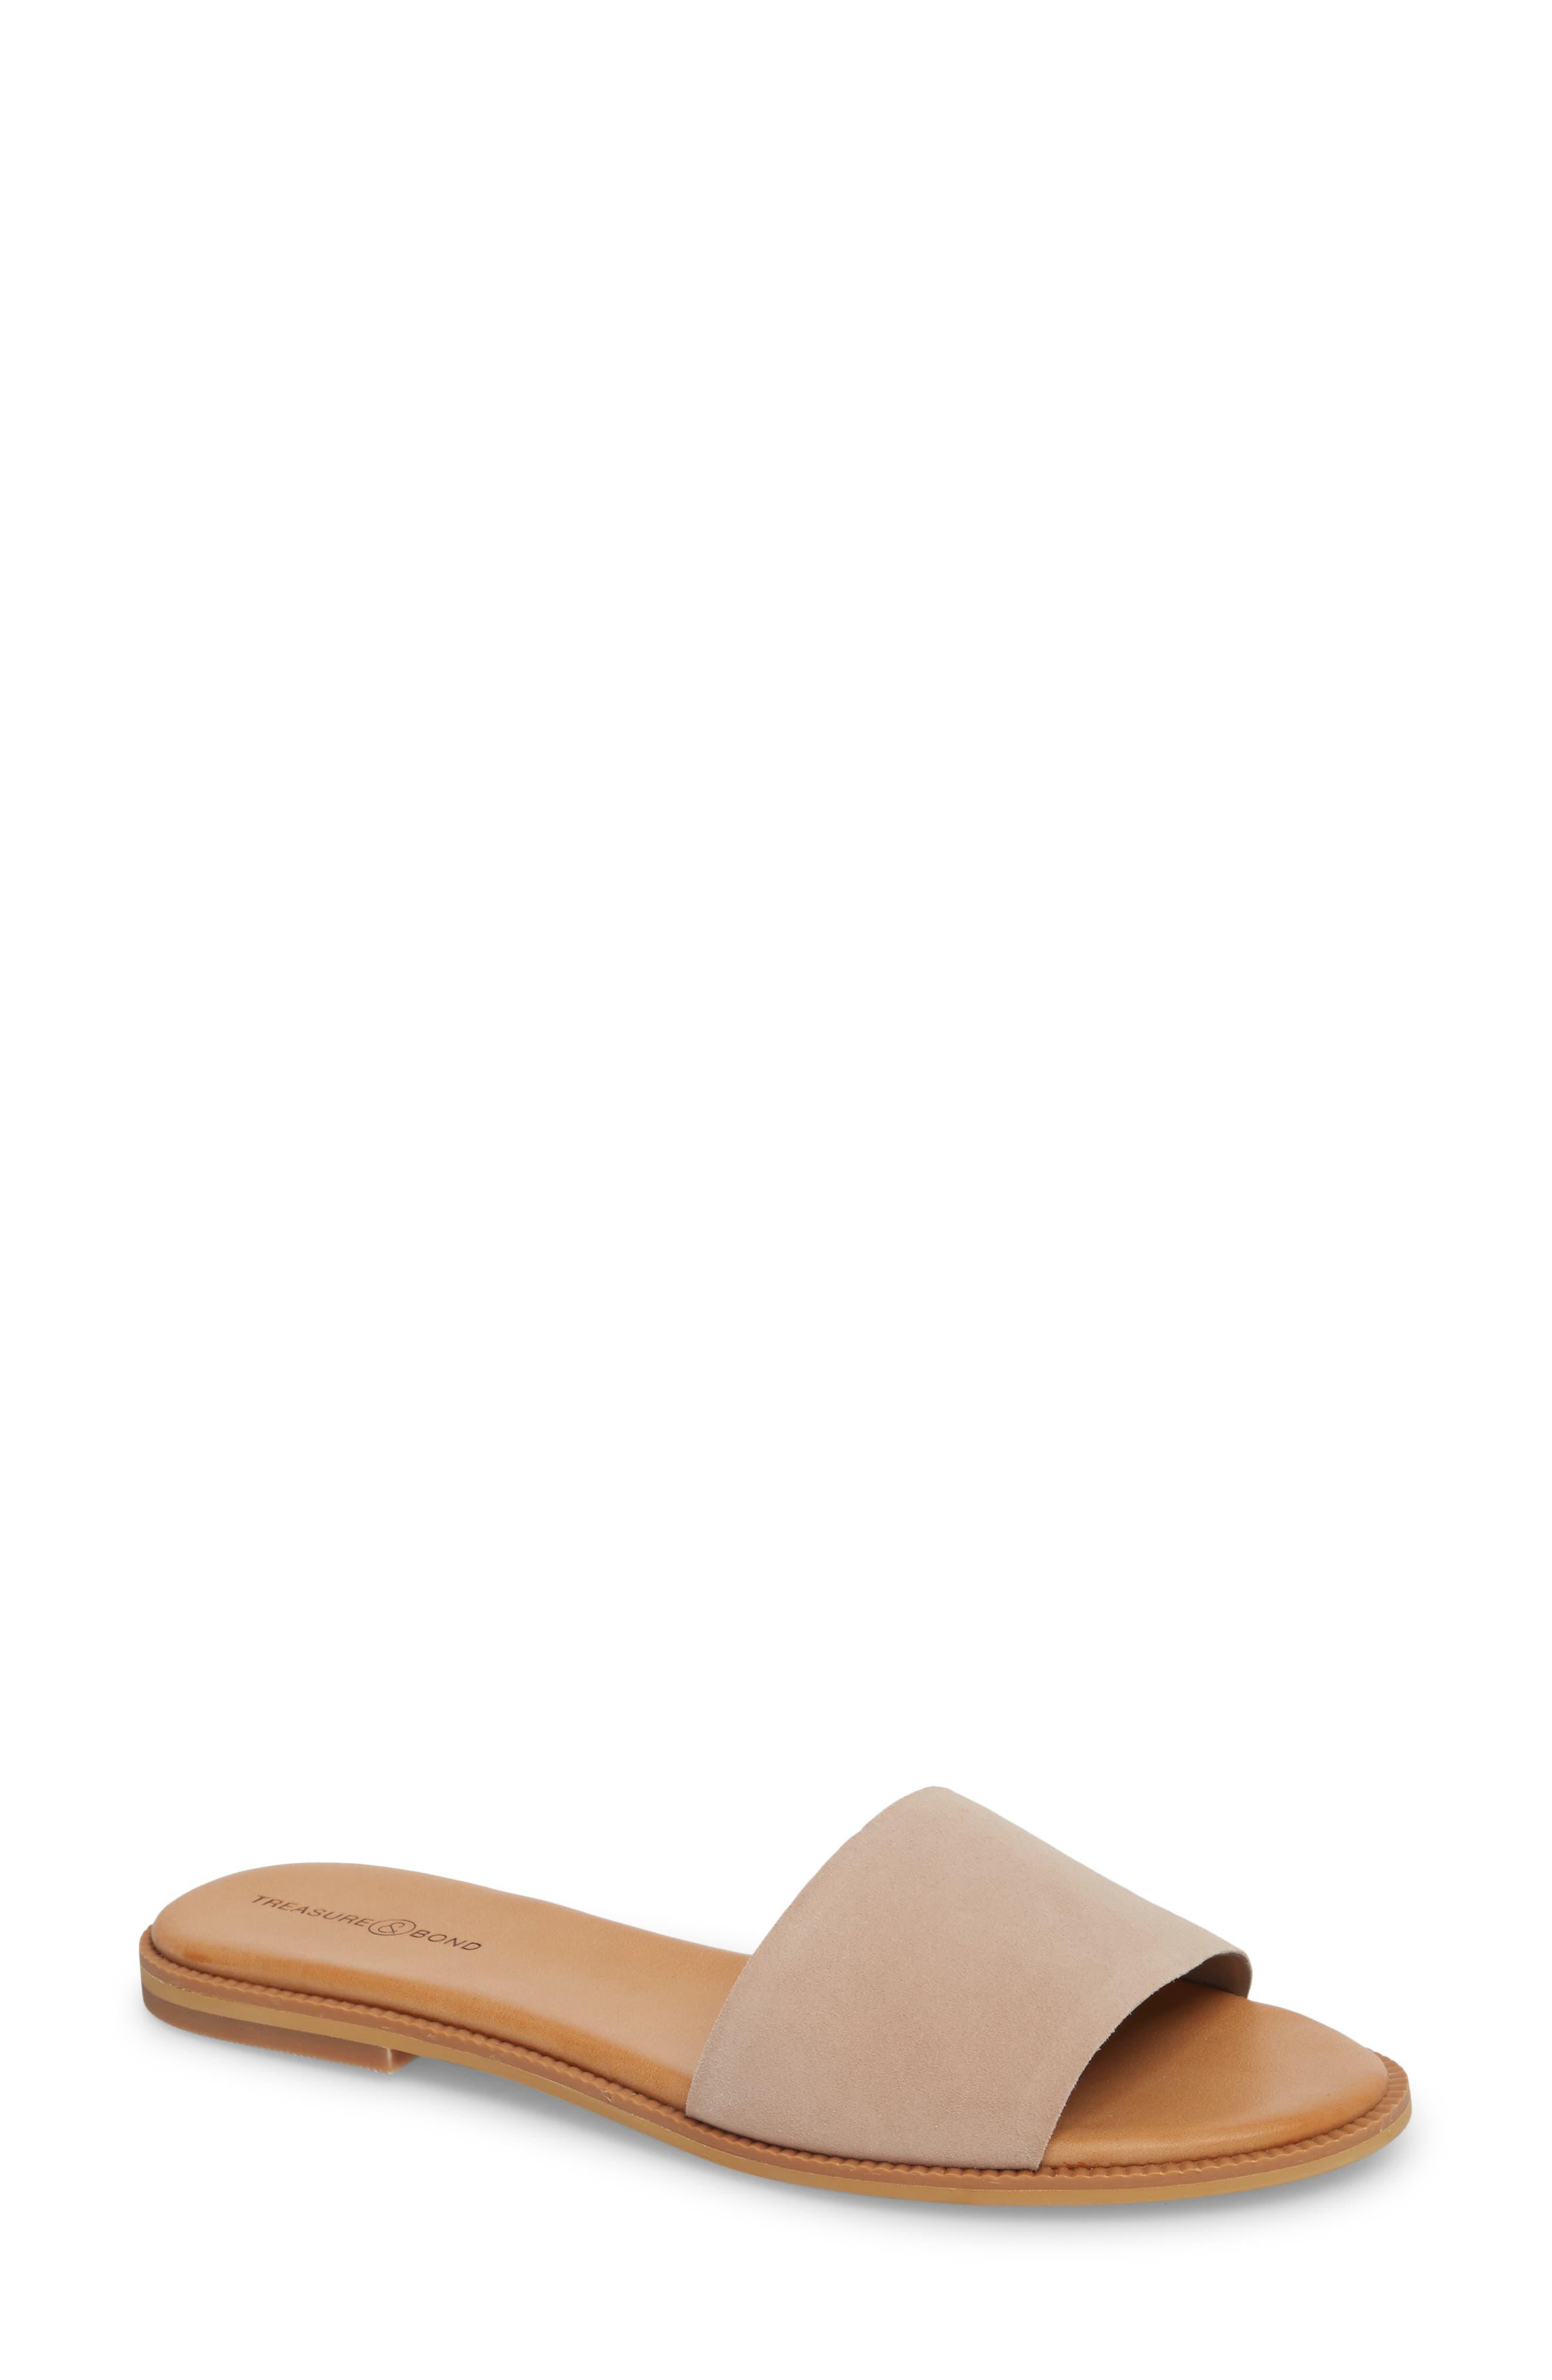 TREASURE & BOND Mere Flat Slide Sandal, Main, color, NEW BLUSH SUEDE